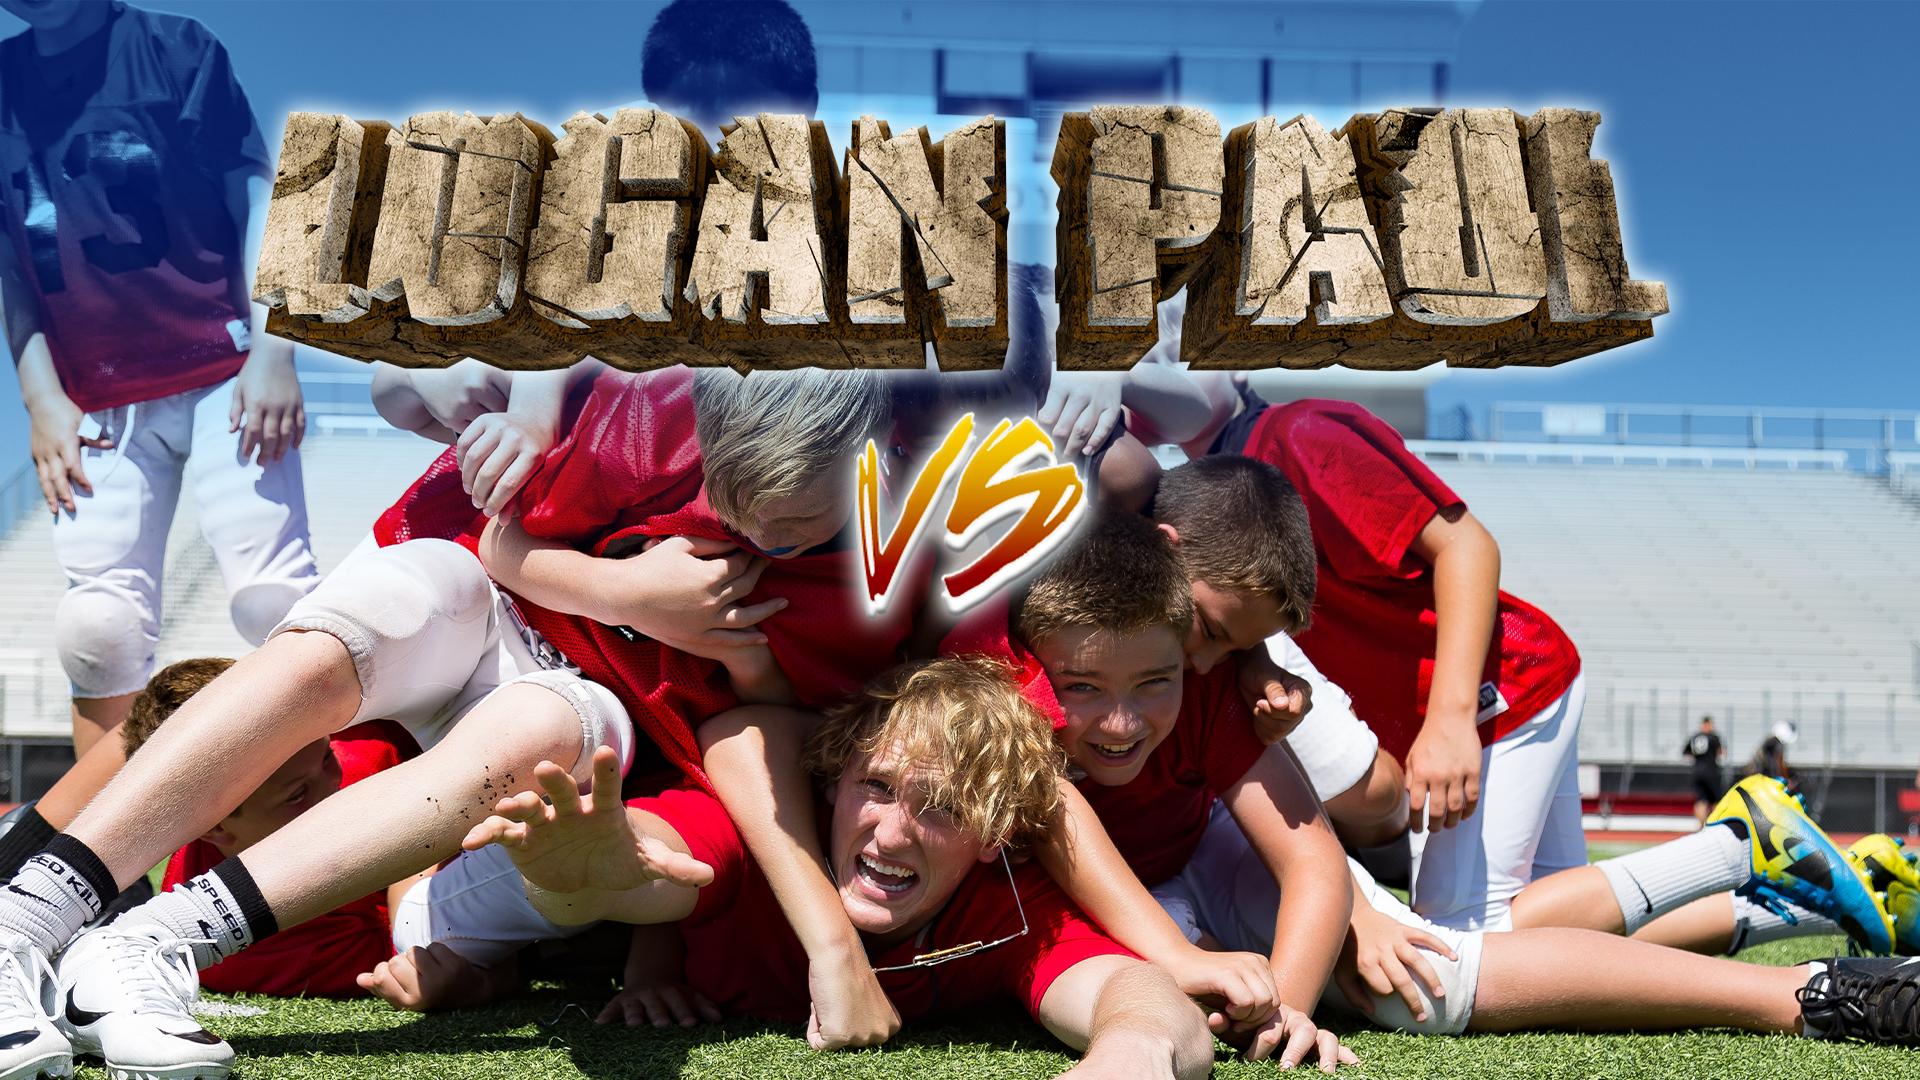 Watch Logan Paul Vs | Prime Video